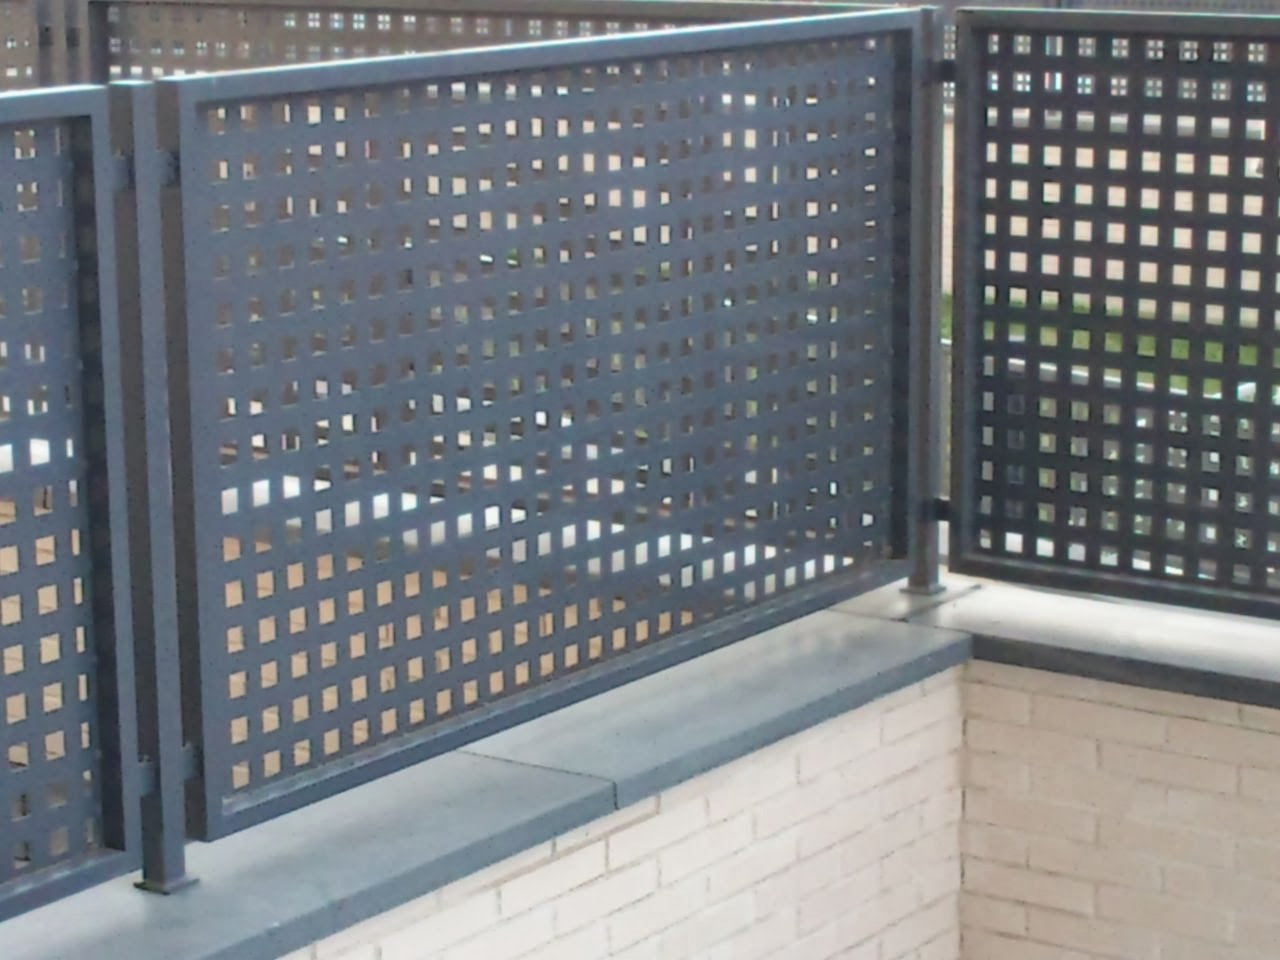 Rejas para puertas tattoo design bild - Rejas de hierro para puertas ...